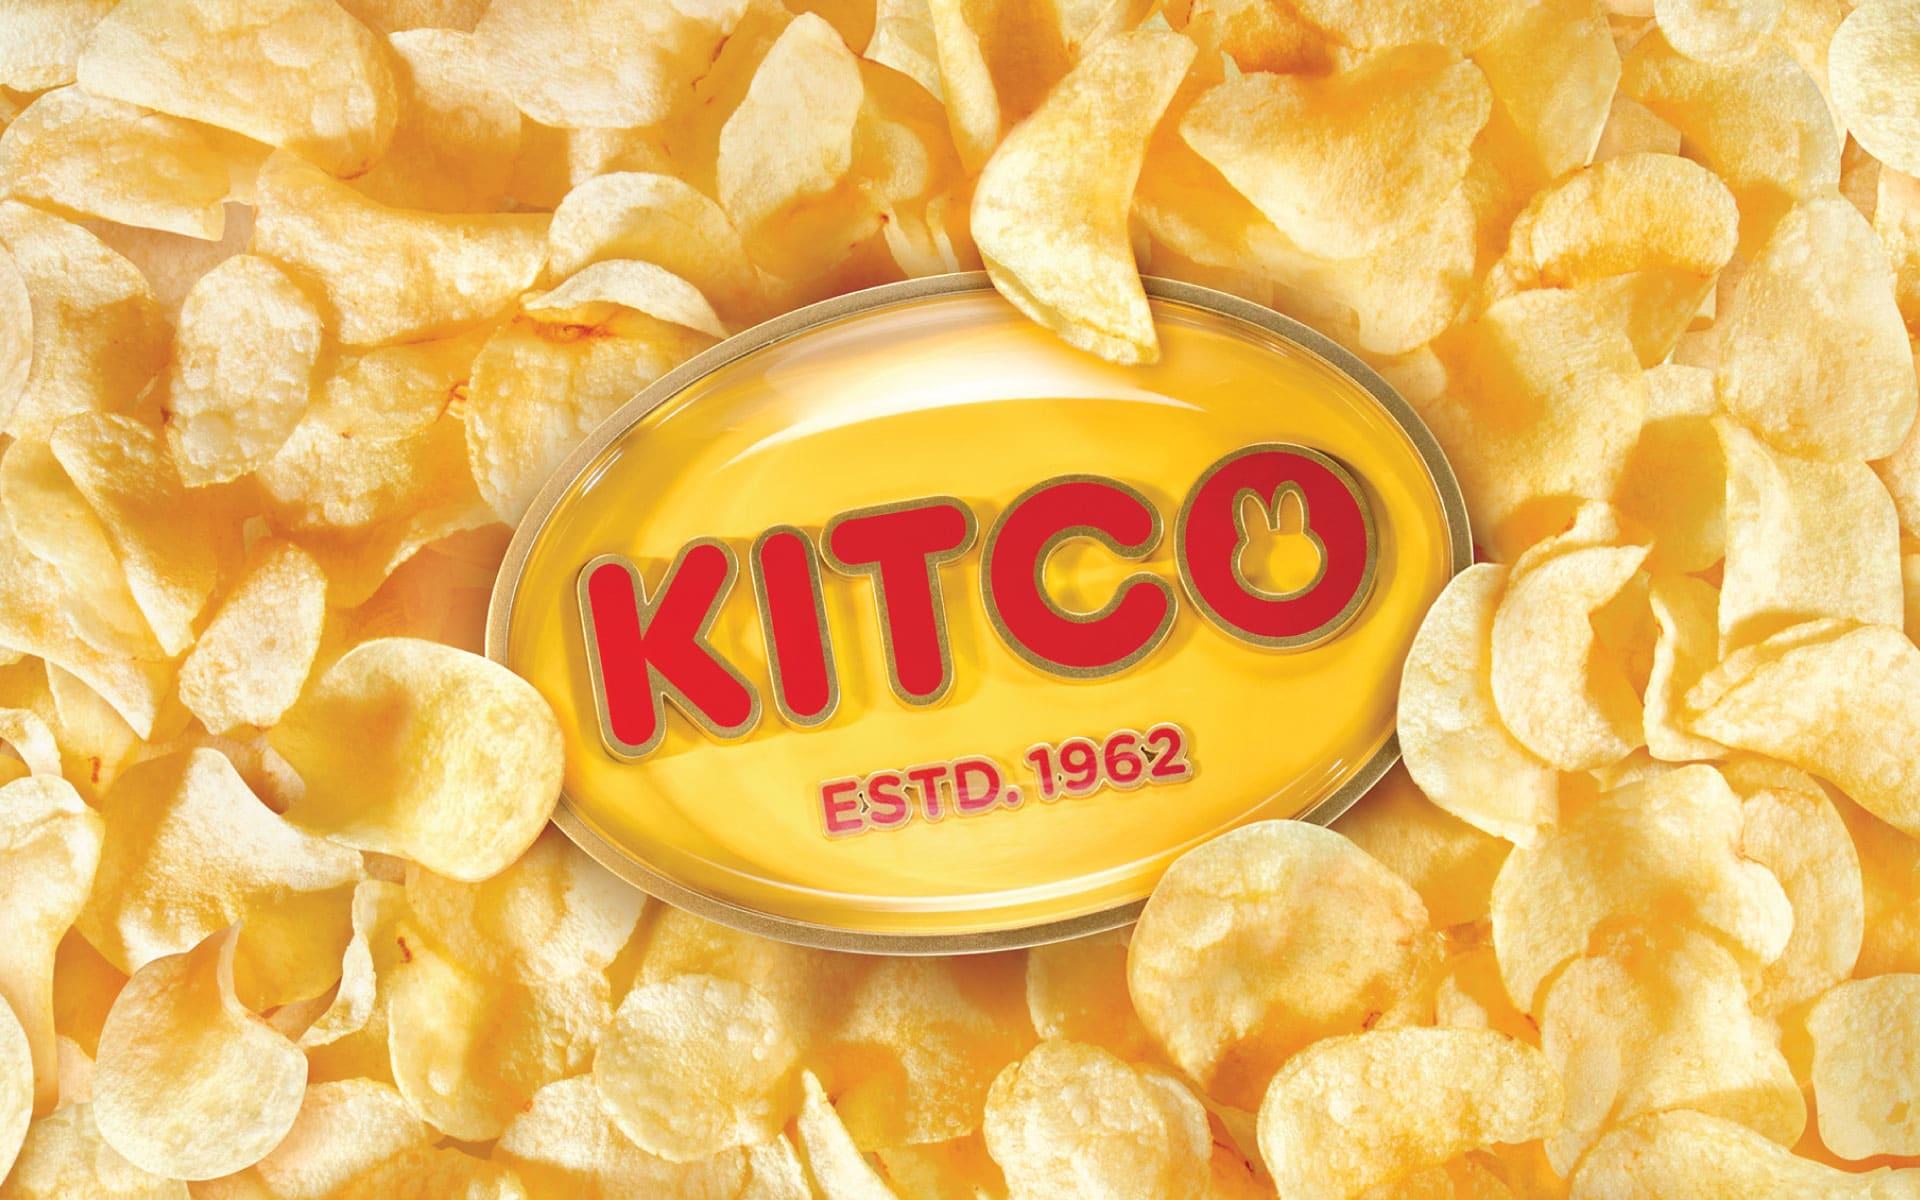 Kitco Masterbrand - Brand Identity